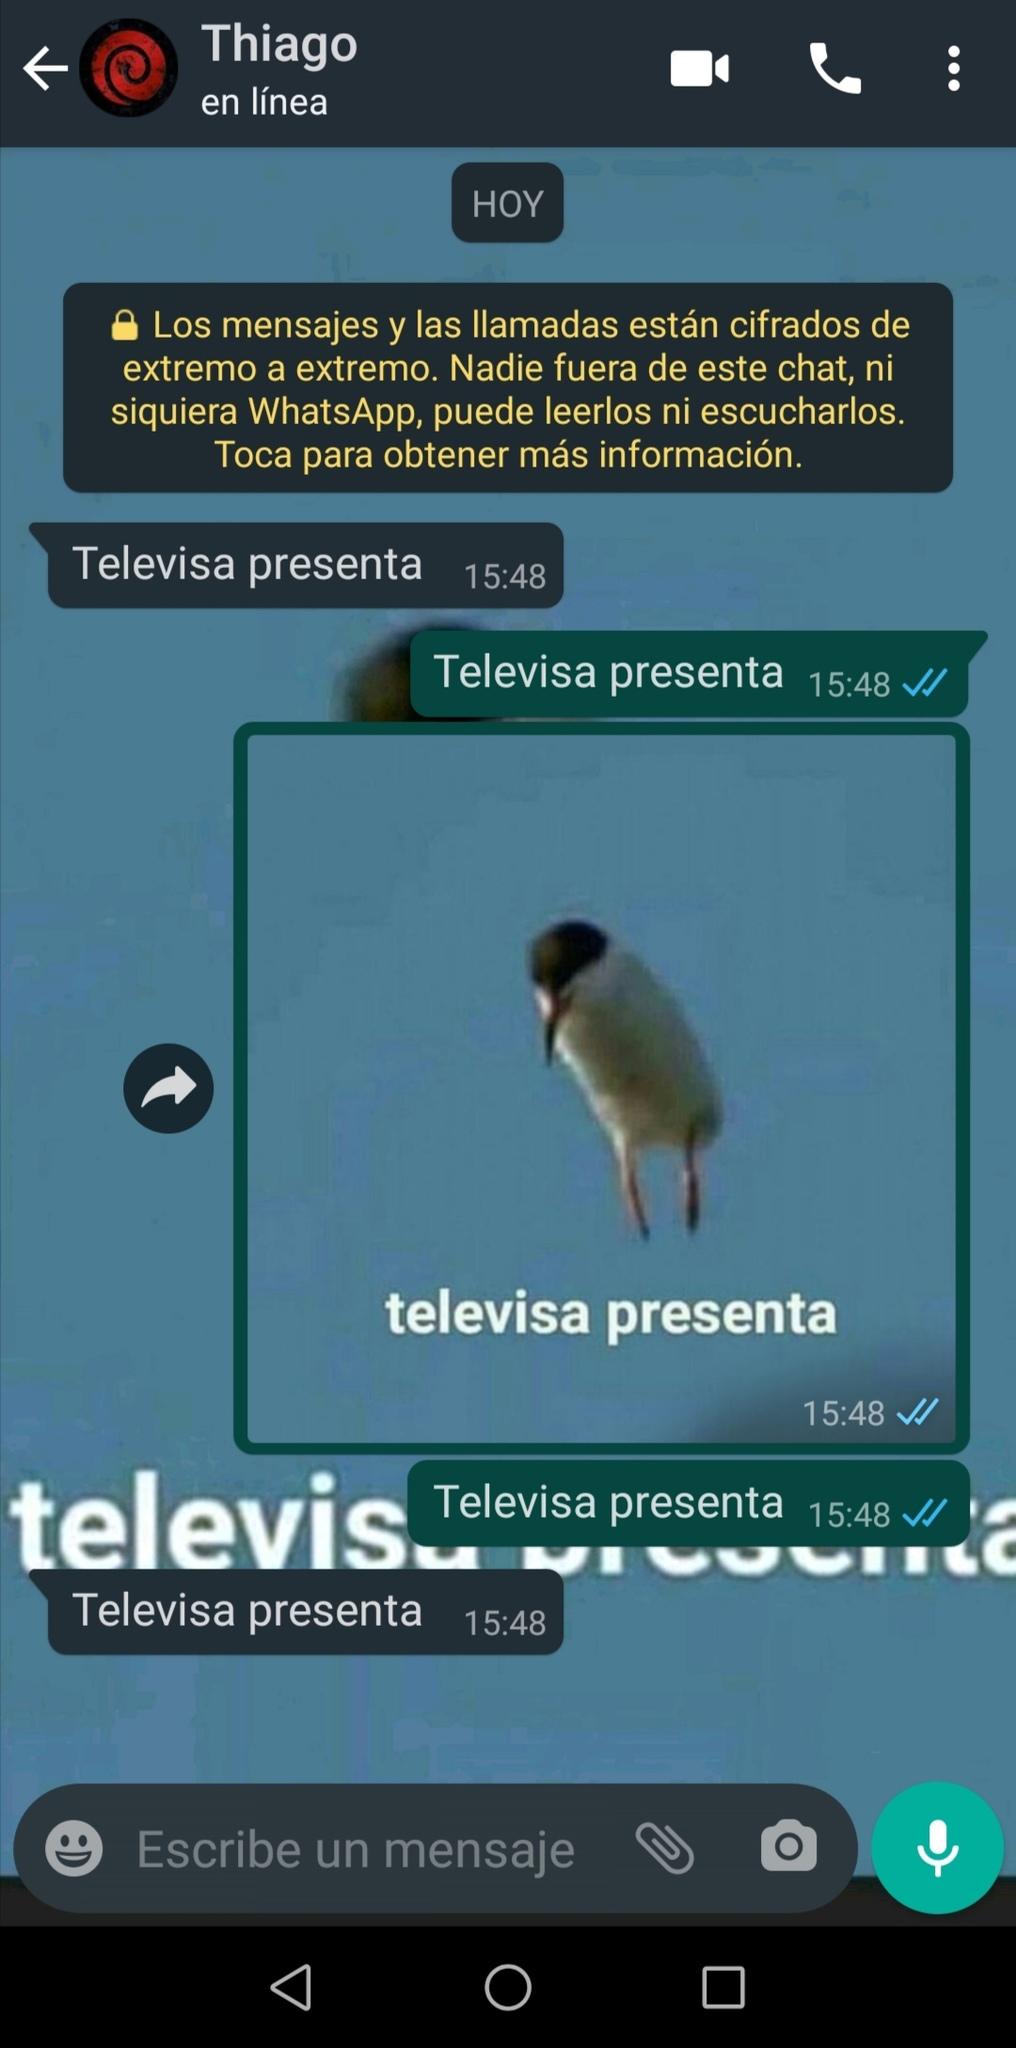 Televisa Presenta - meme